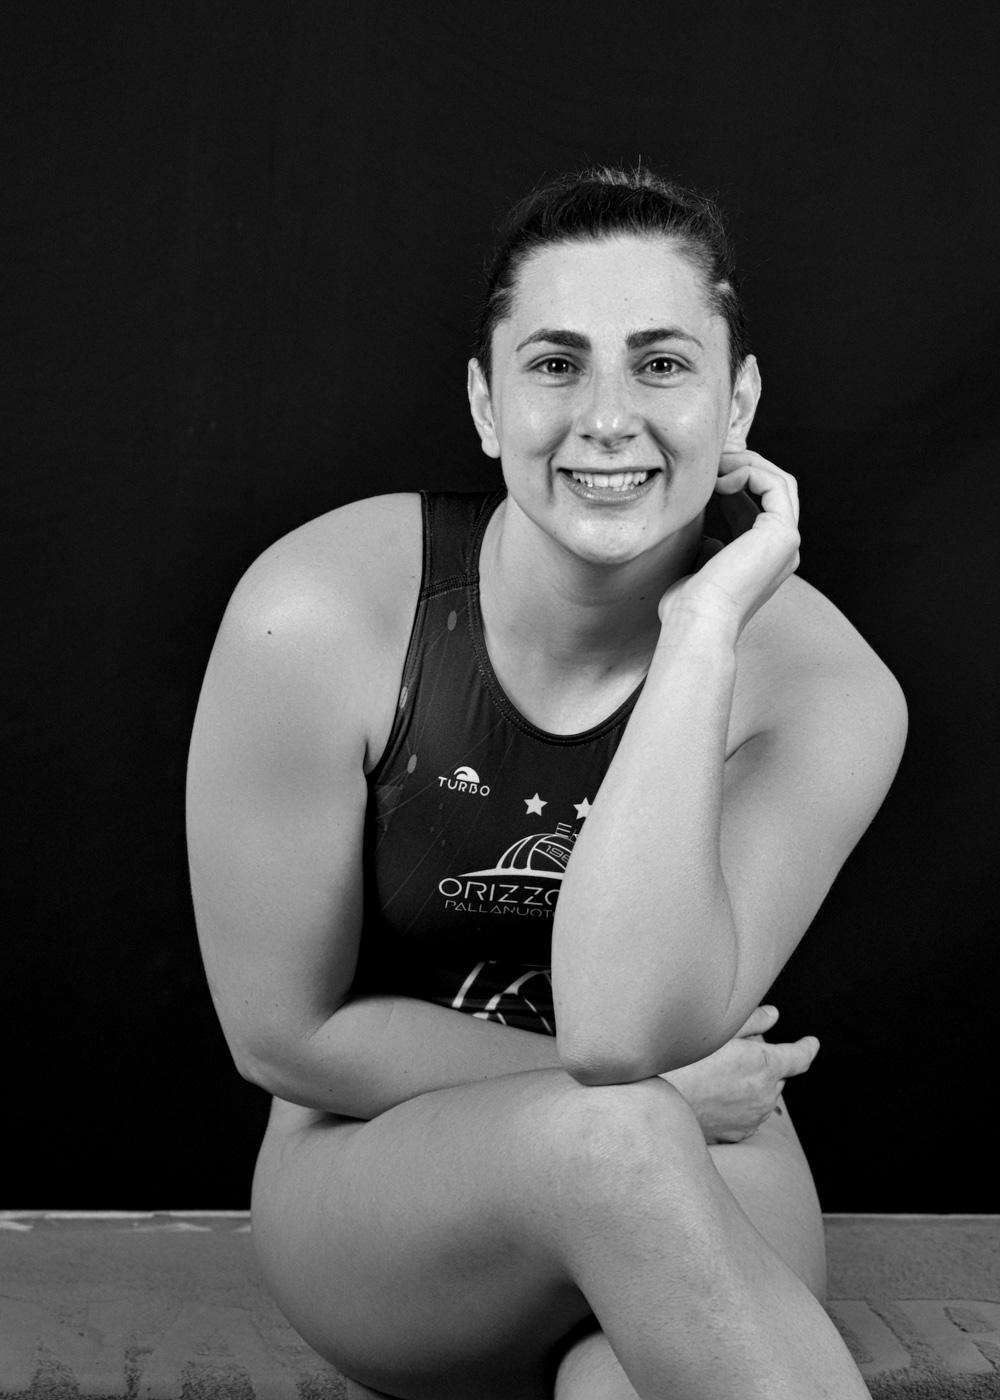 Isabella Riccioli